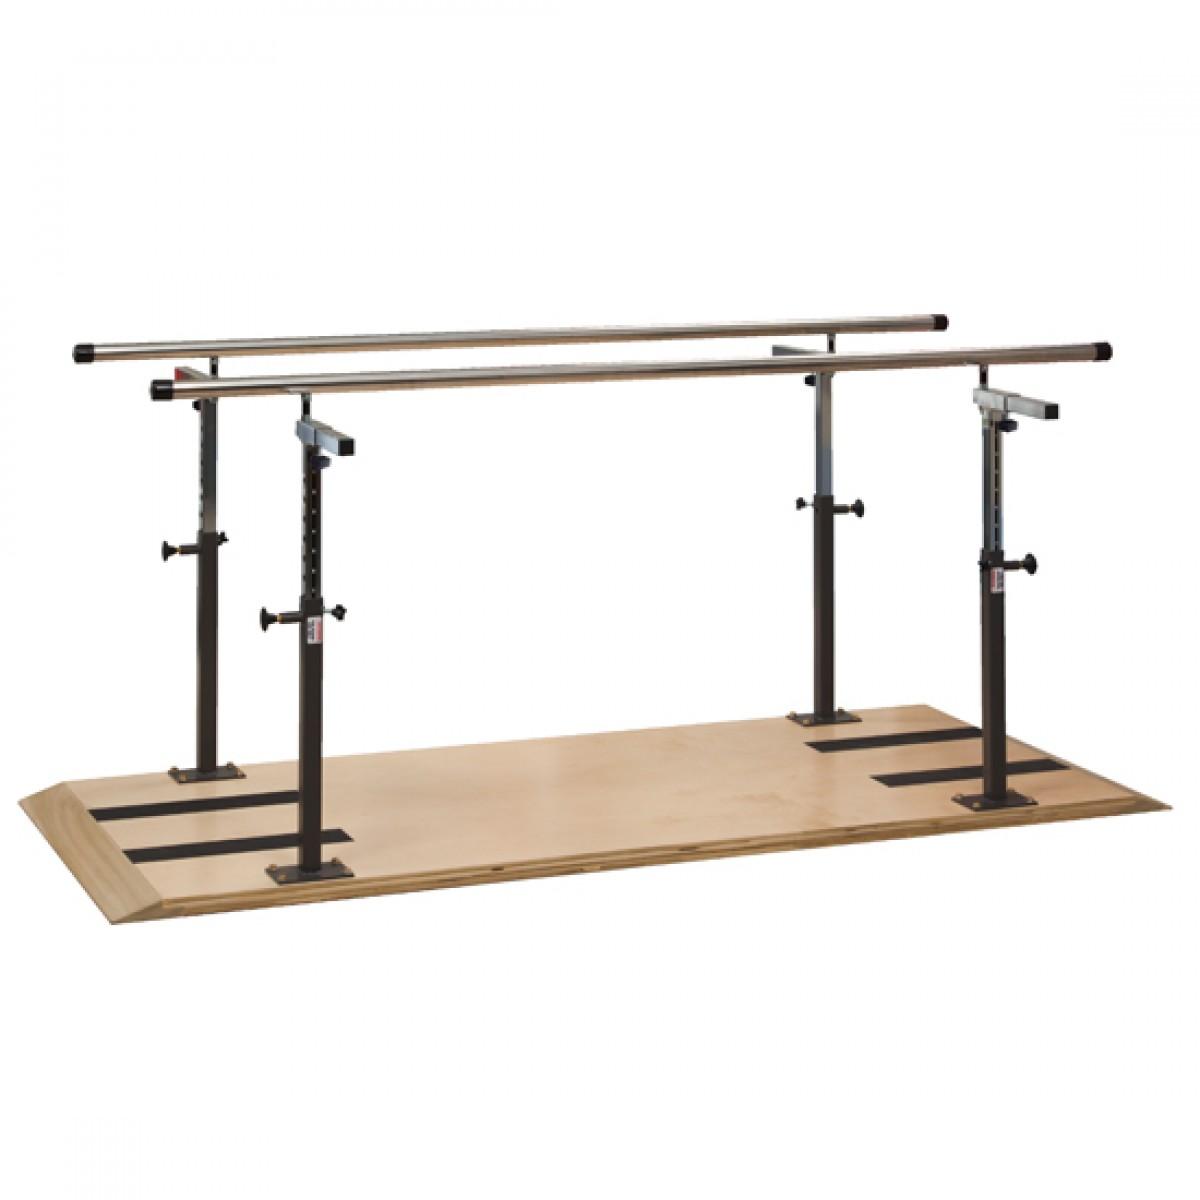 Platform Mounted Parallel Bars Clinton Platform Mounted